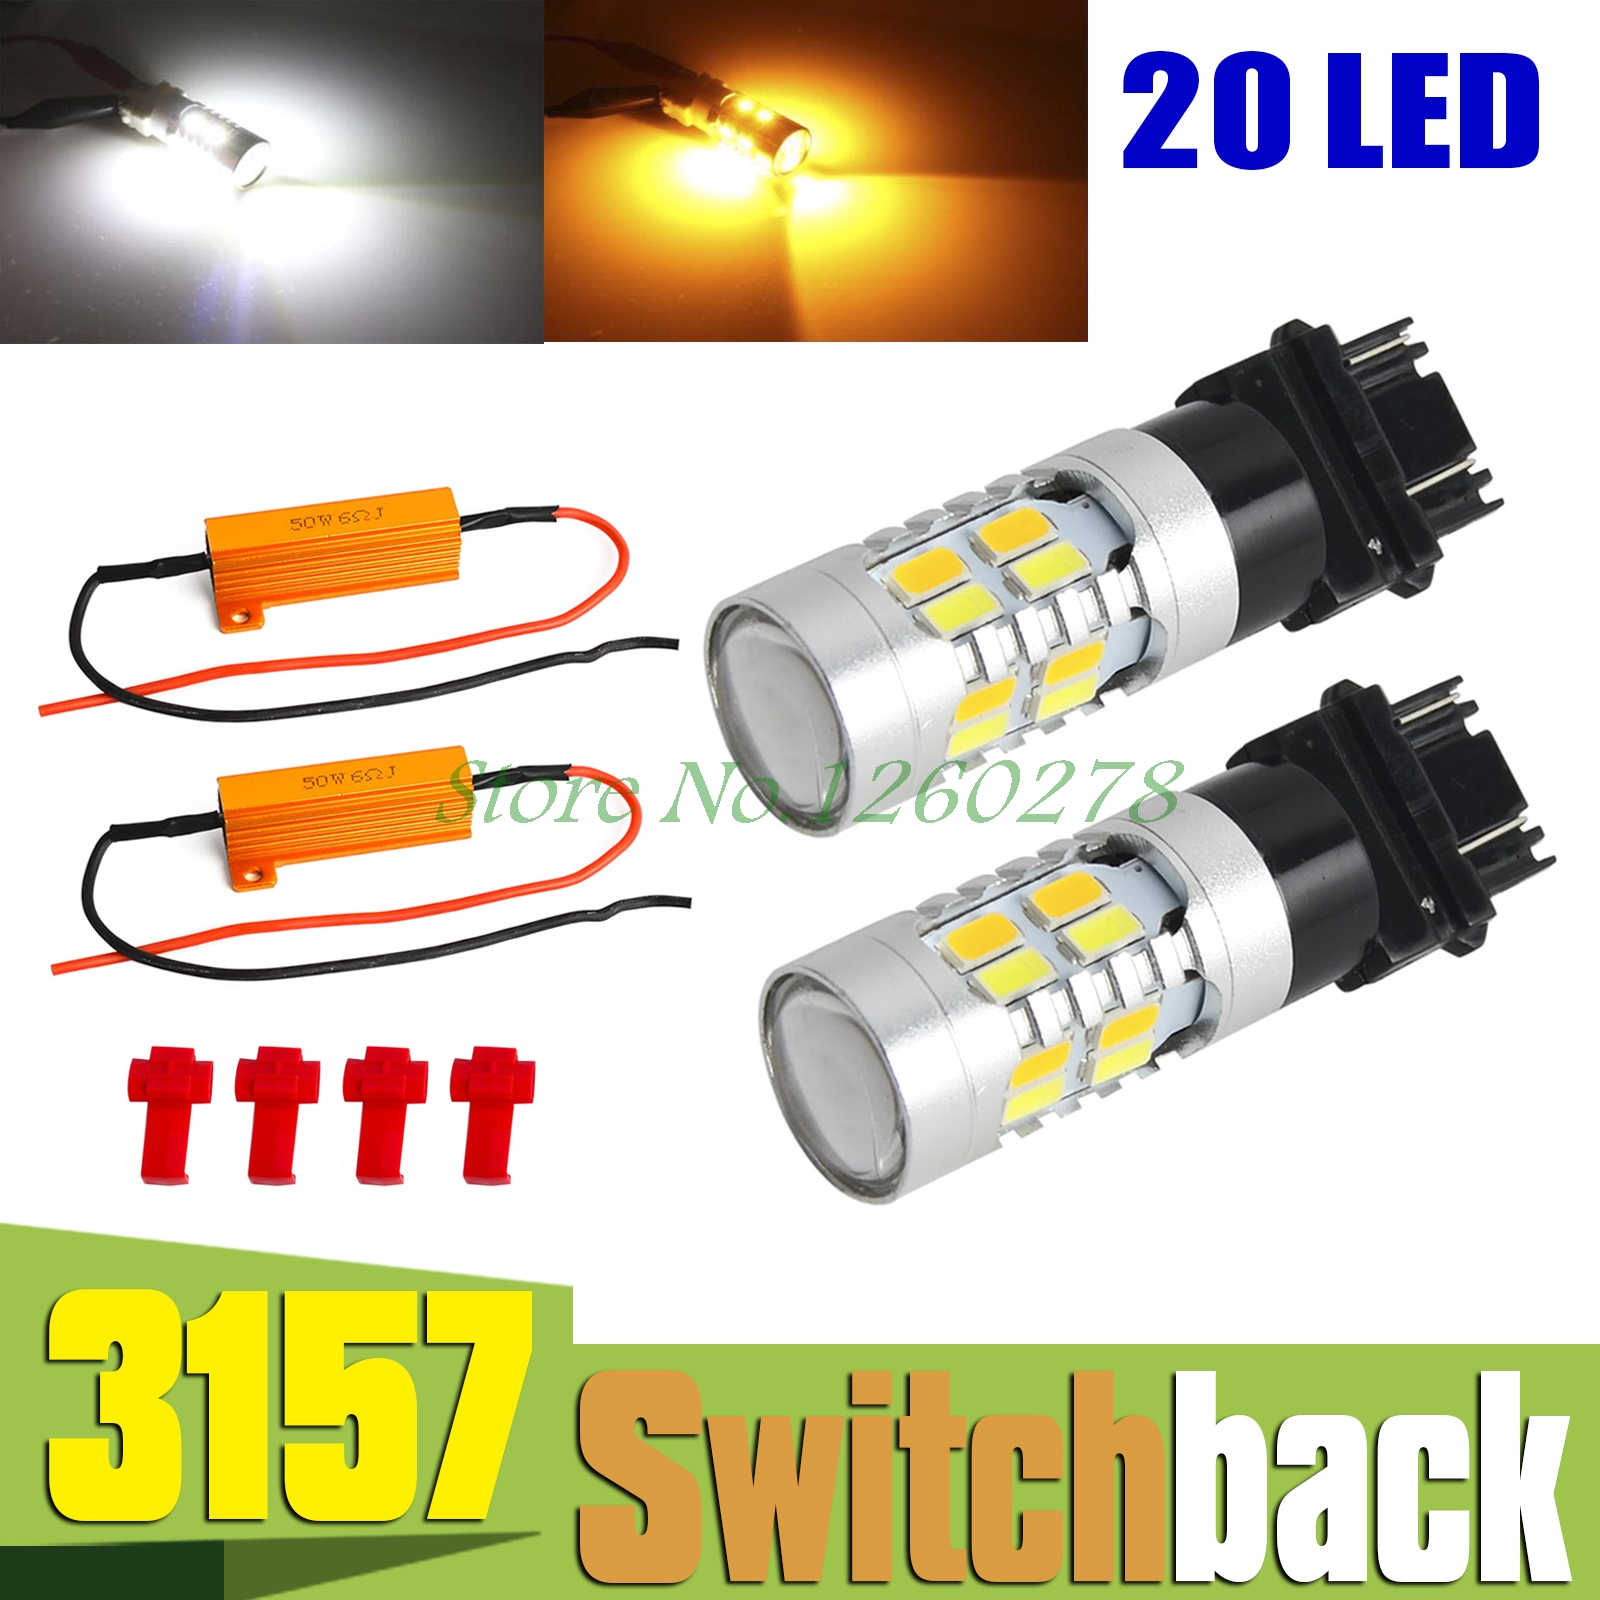 3157 White Amber Dual Color Switchback LED Turn Signal Light Bulbs+Resistors 2pcs 3157 switchback bulbs turn signal light 3056 3156 3057 led car bulbs 42smd dual color amber white pack of 2